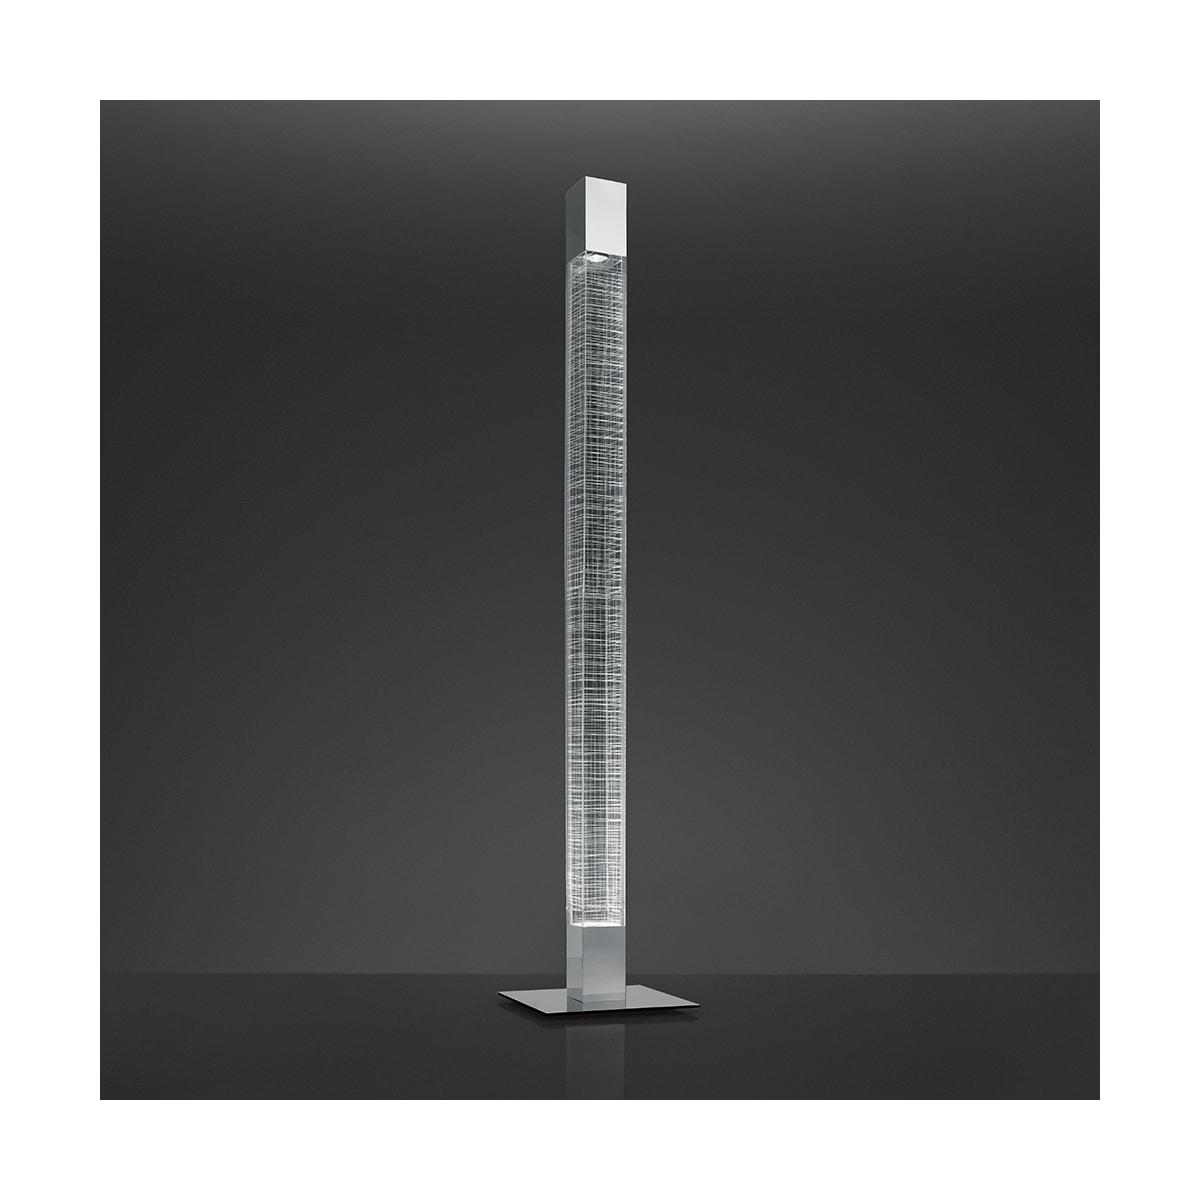 Artemide Usc 1835015a Polished Aluminum Mimesi Single Light 71 Tall Integrated Led Column Floor Lamp Lightingshowplace Com